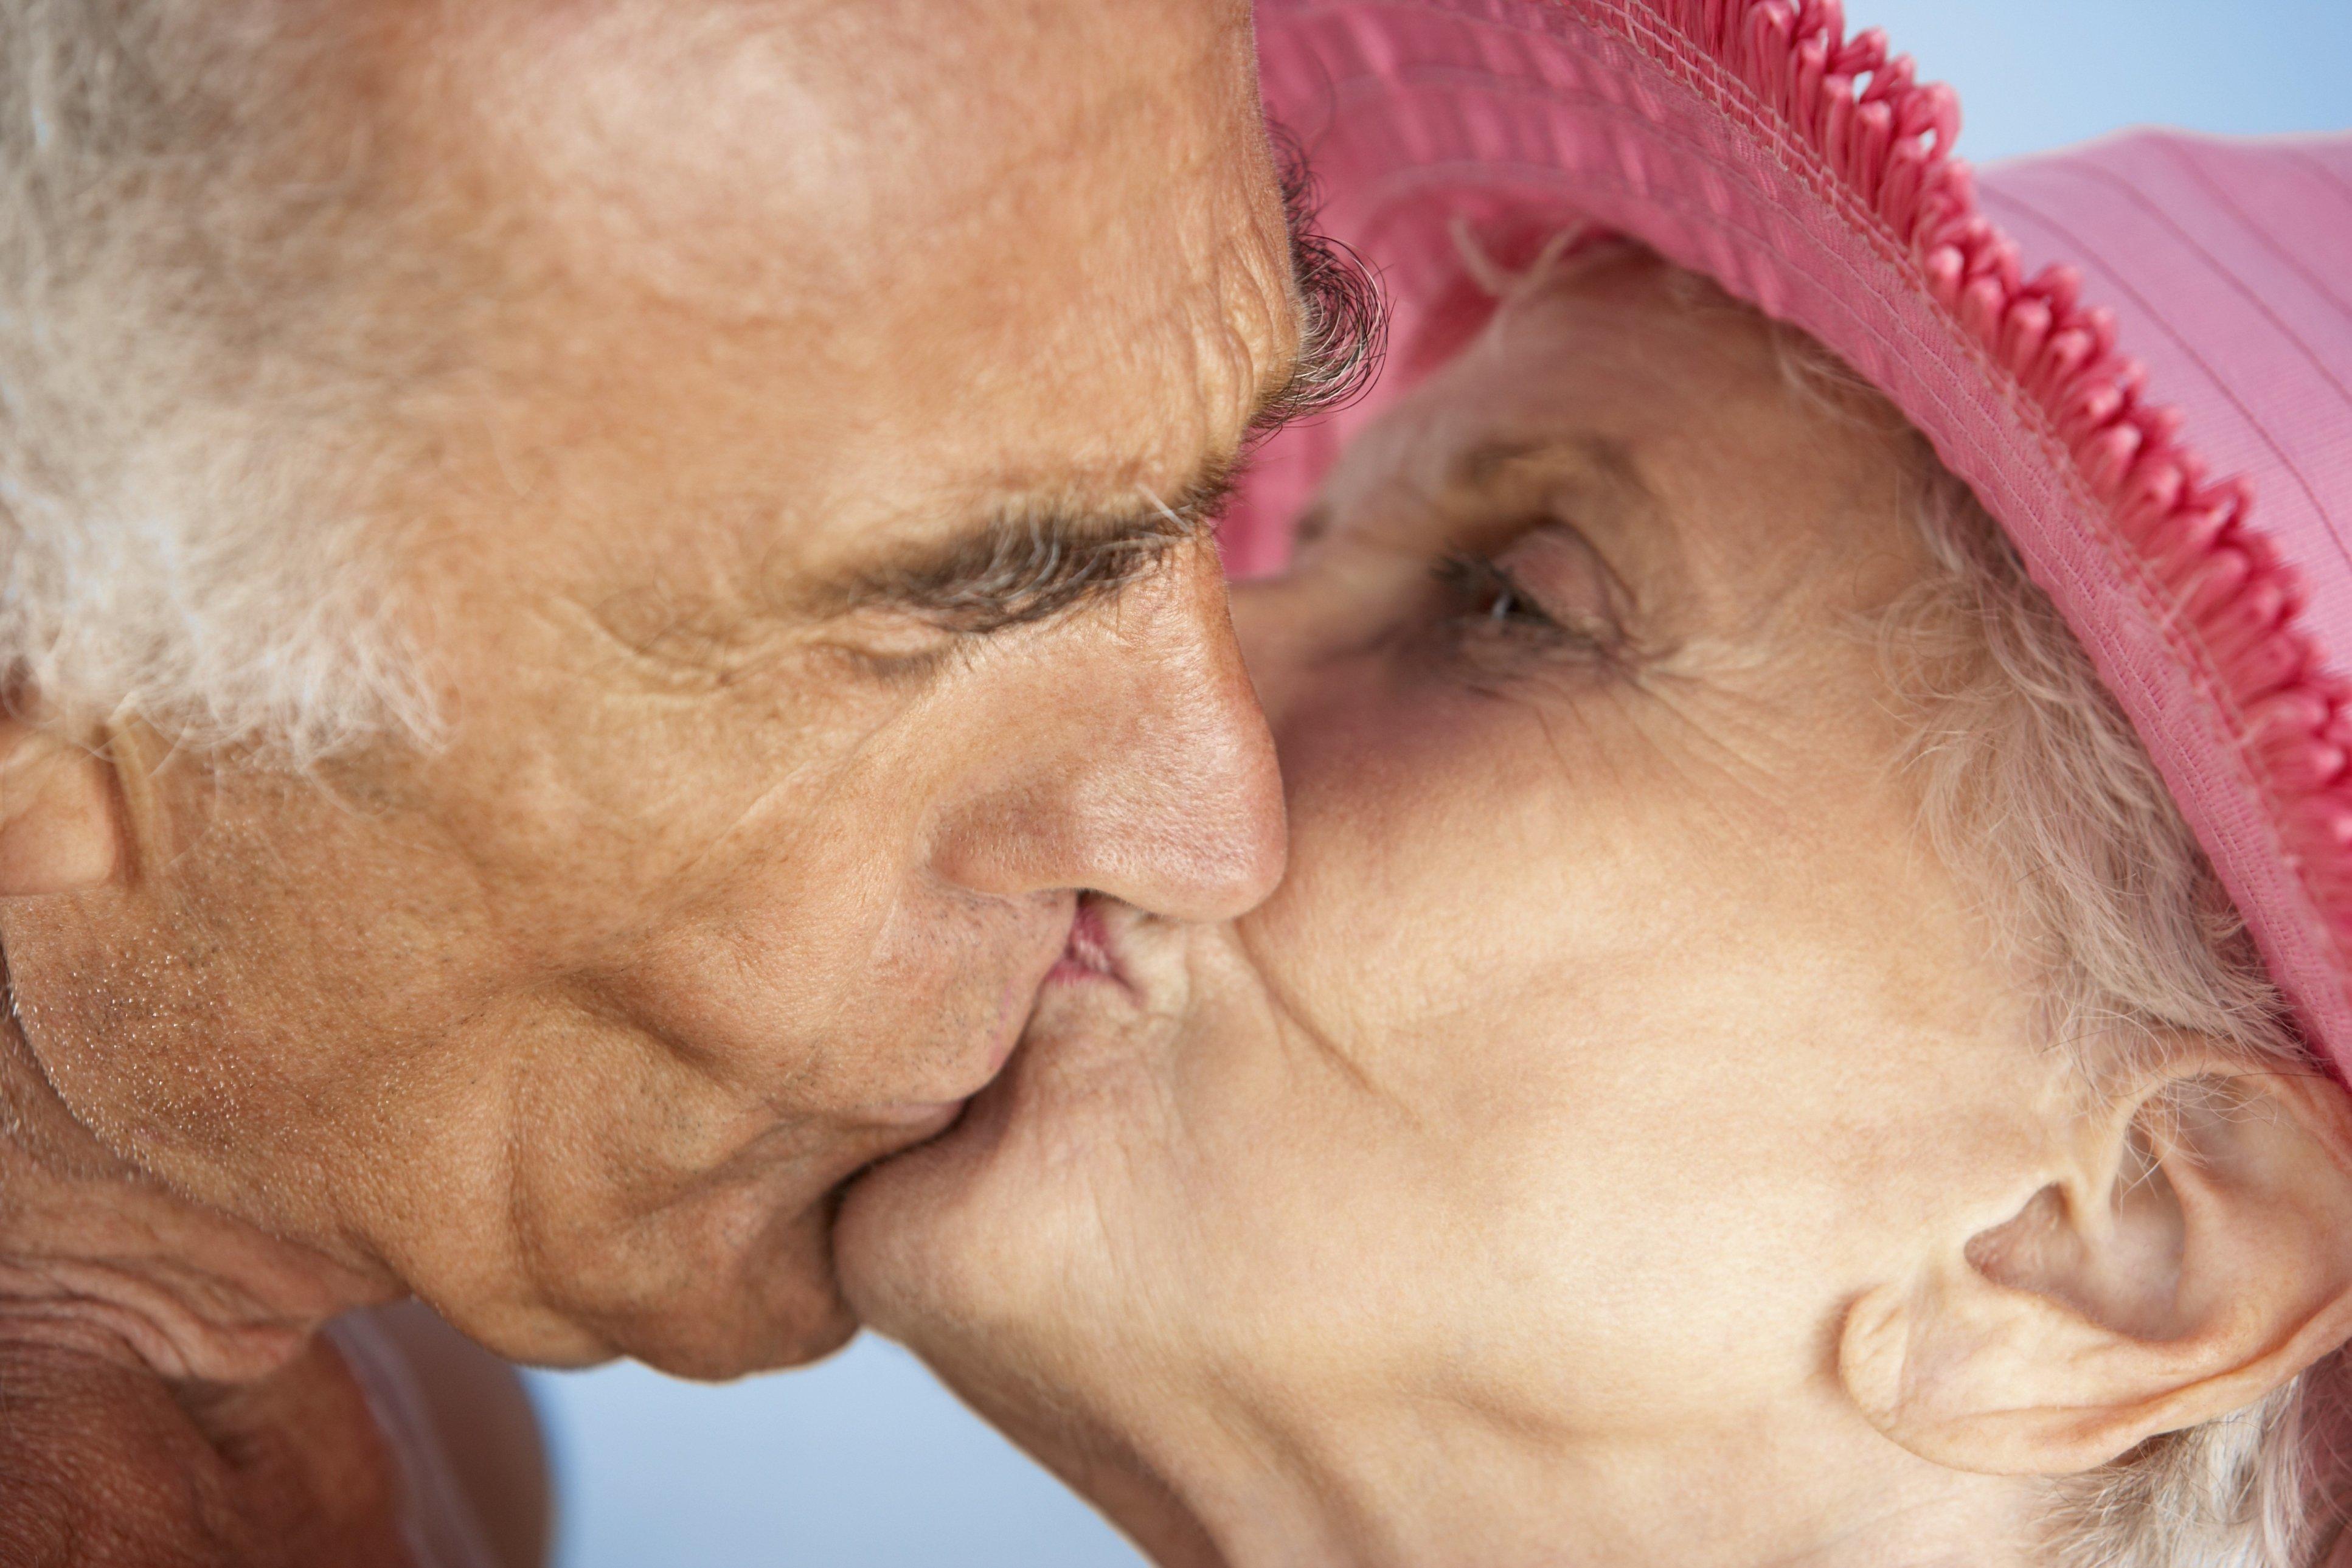 Myths on older people having sex